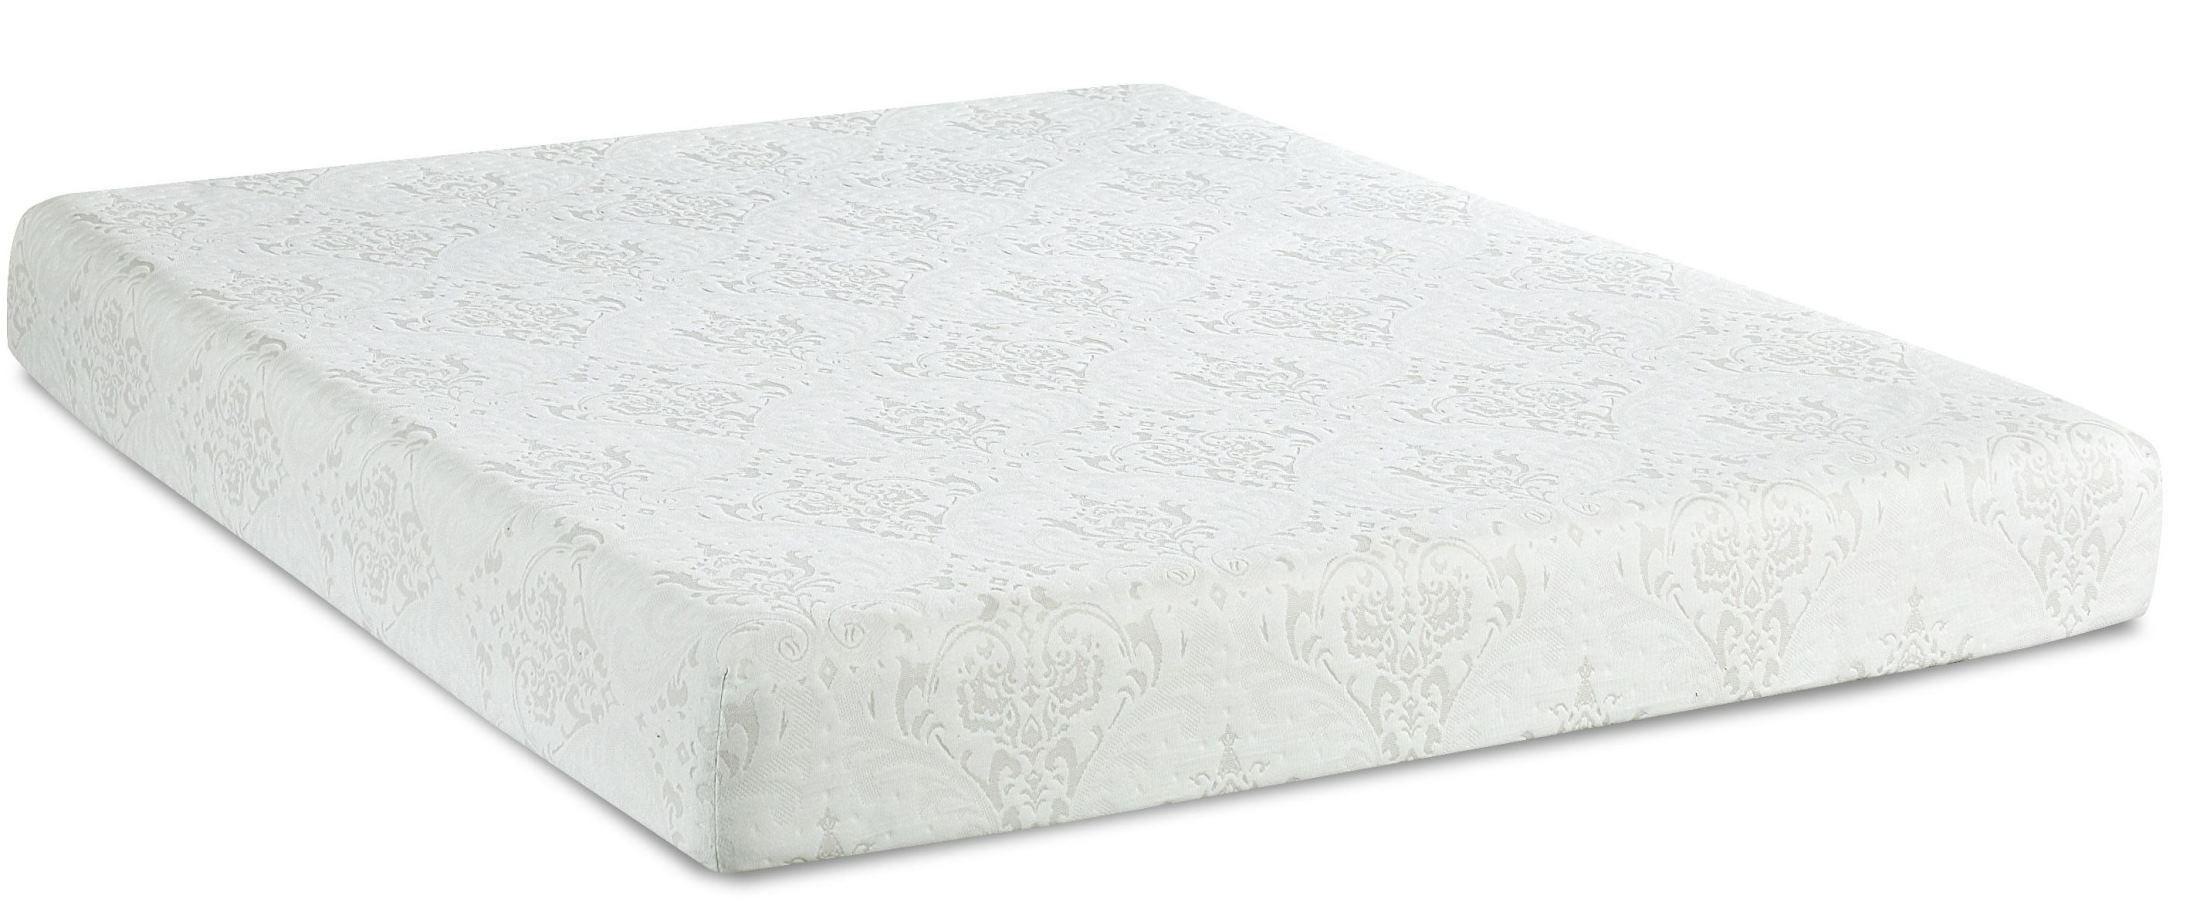 hampton 8 memory foam king mattress from klaussner hamptonkkmat coleman furniture. Black Bedroom Furniture Sets. Home Design Ideas